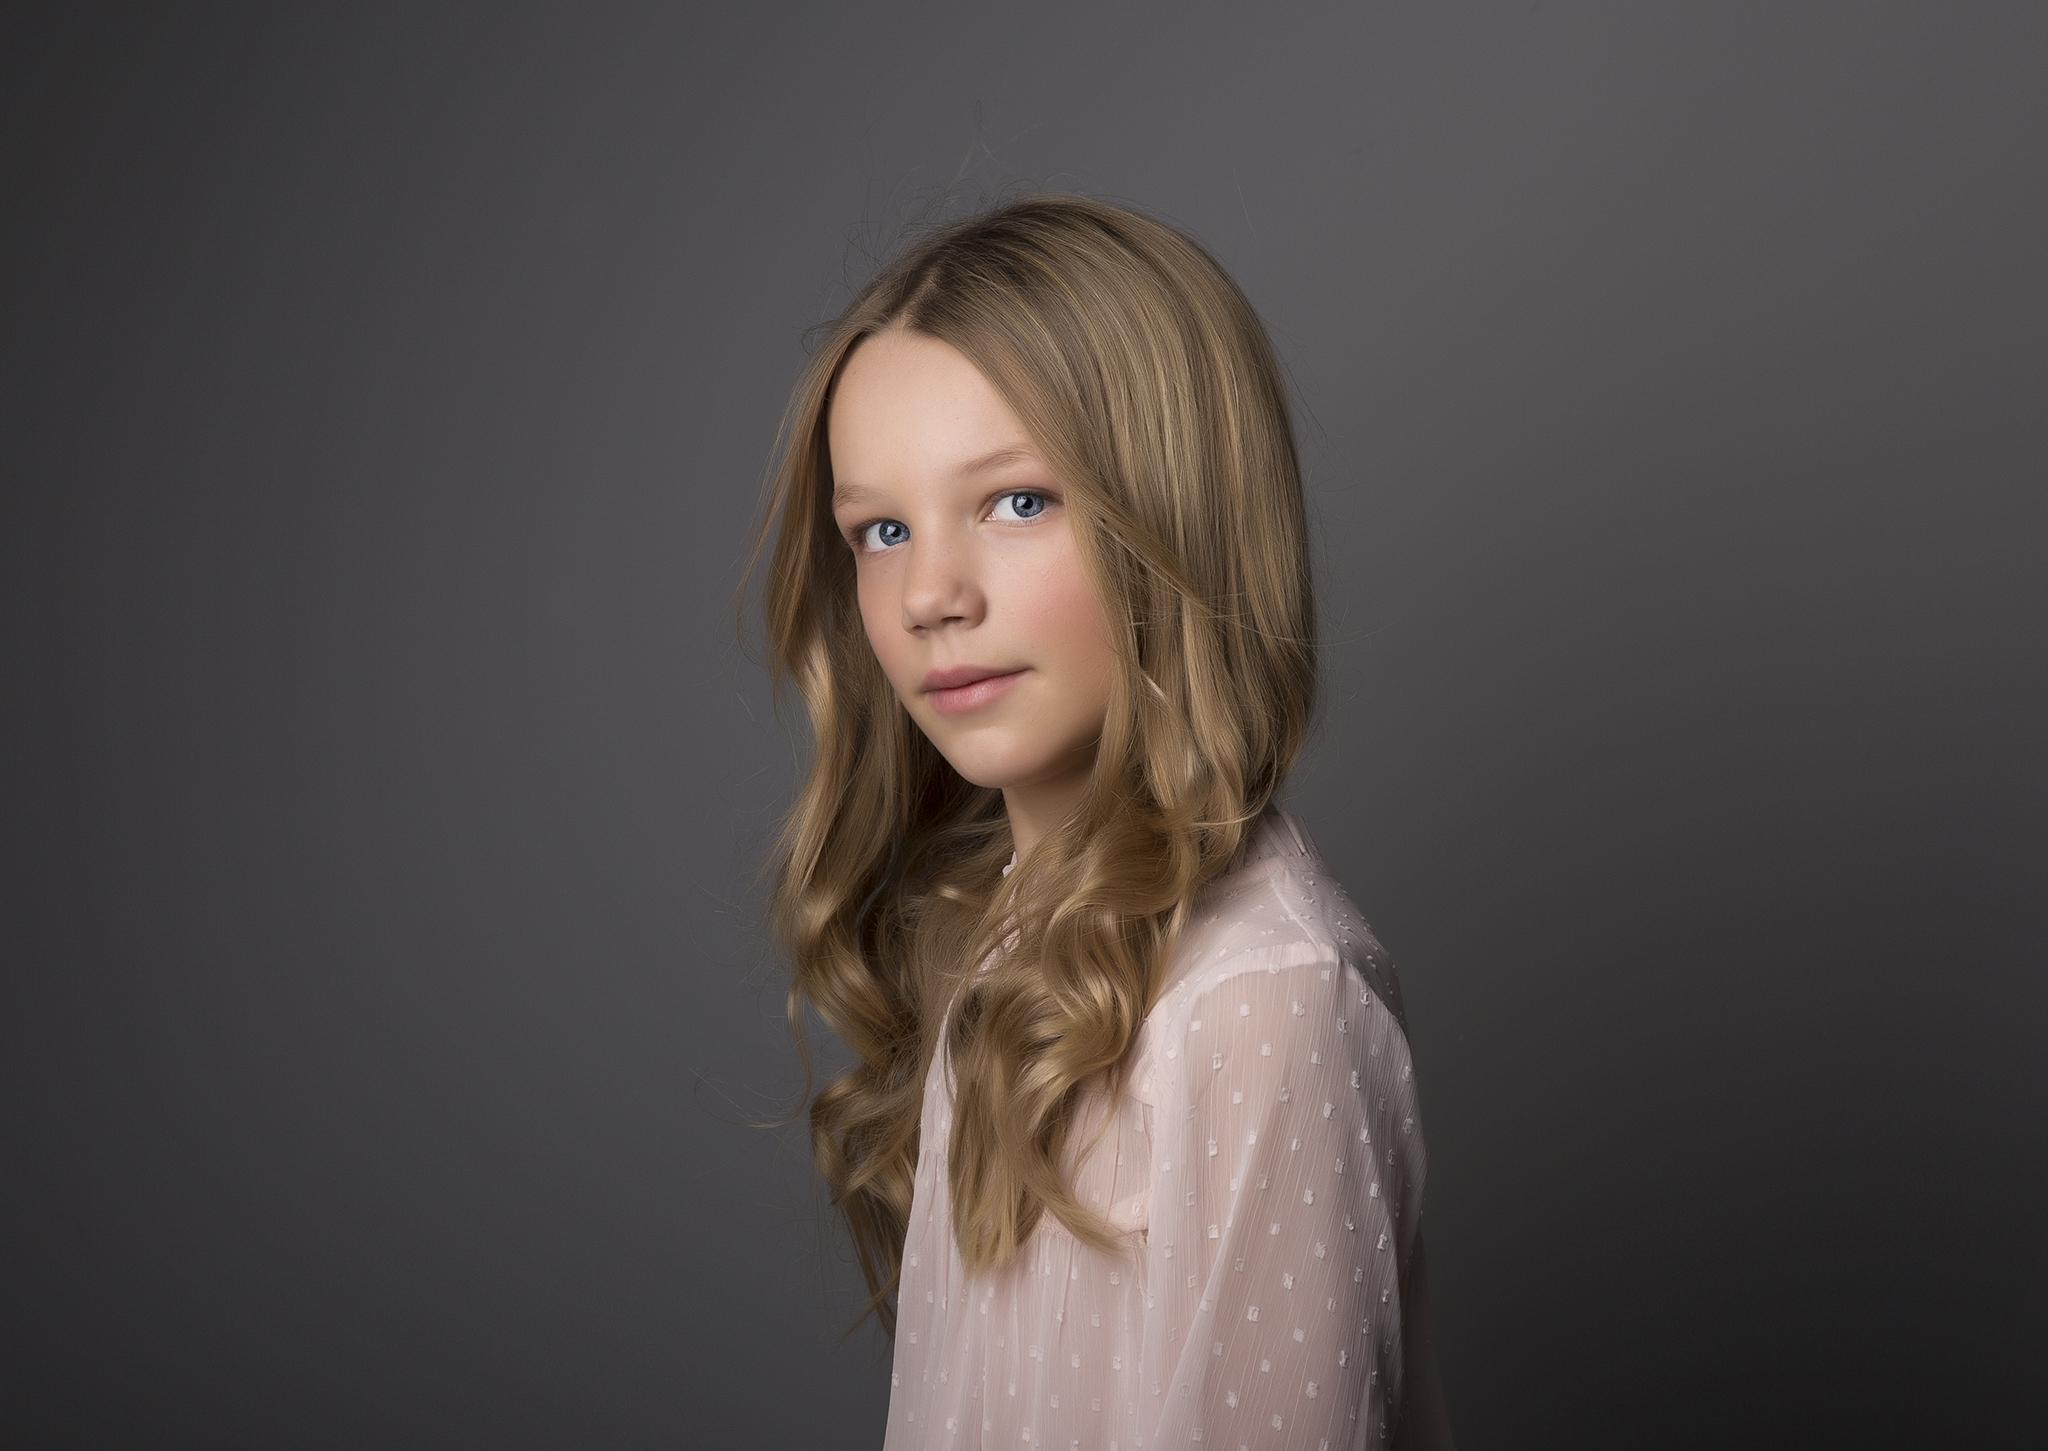 elizabethgphotography_childrens_fineart_kingslangley_hertfordshire_family_photographer_isabella_2a.jpg